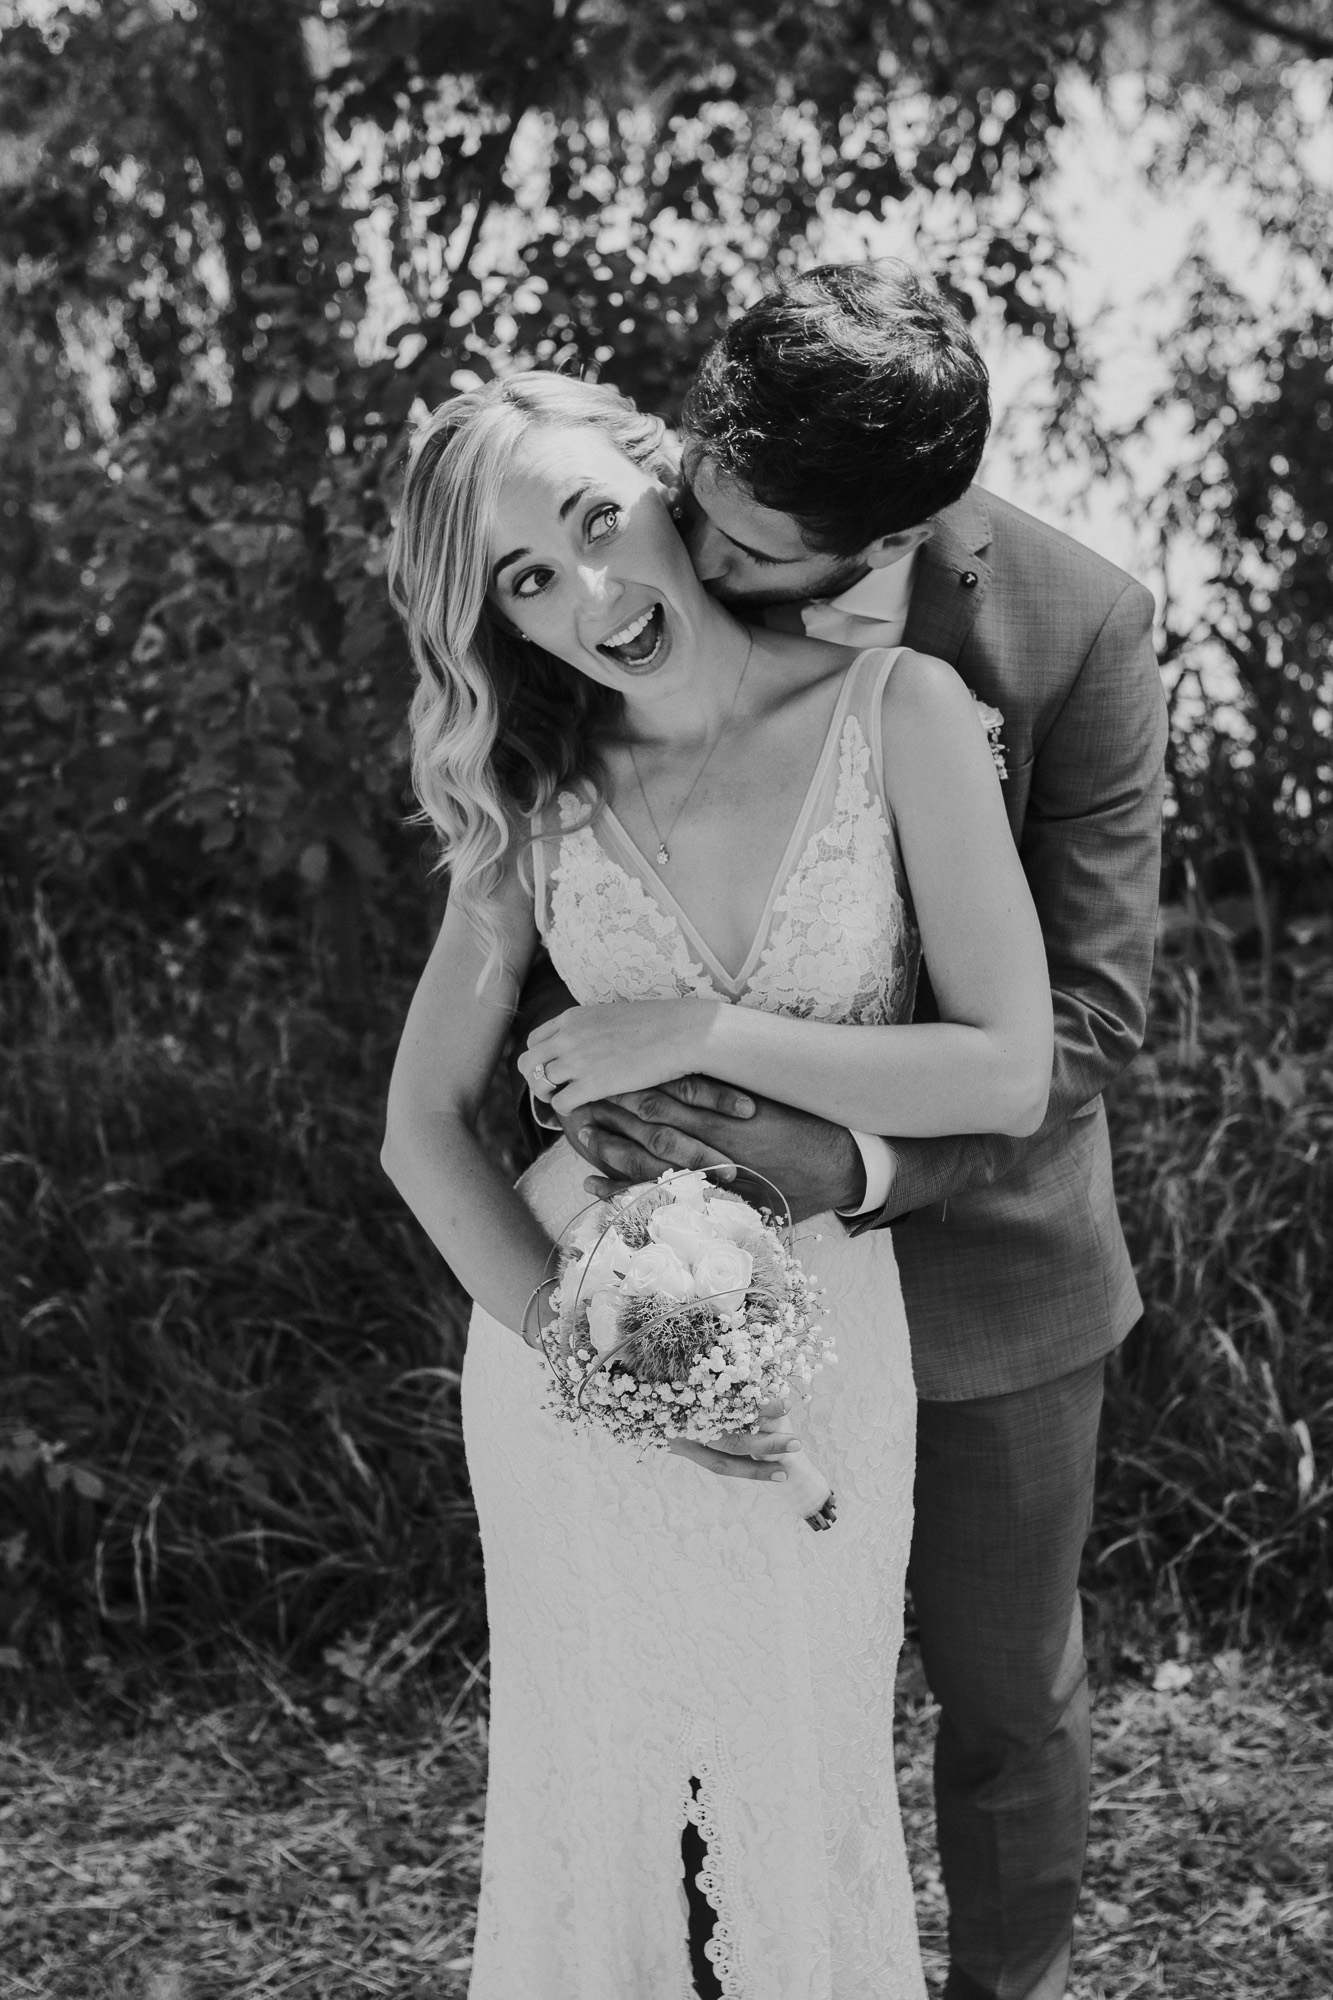 20180720-Memoryfactory-Sara&Jacopo-32- Hochzeit.jpg